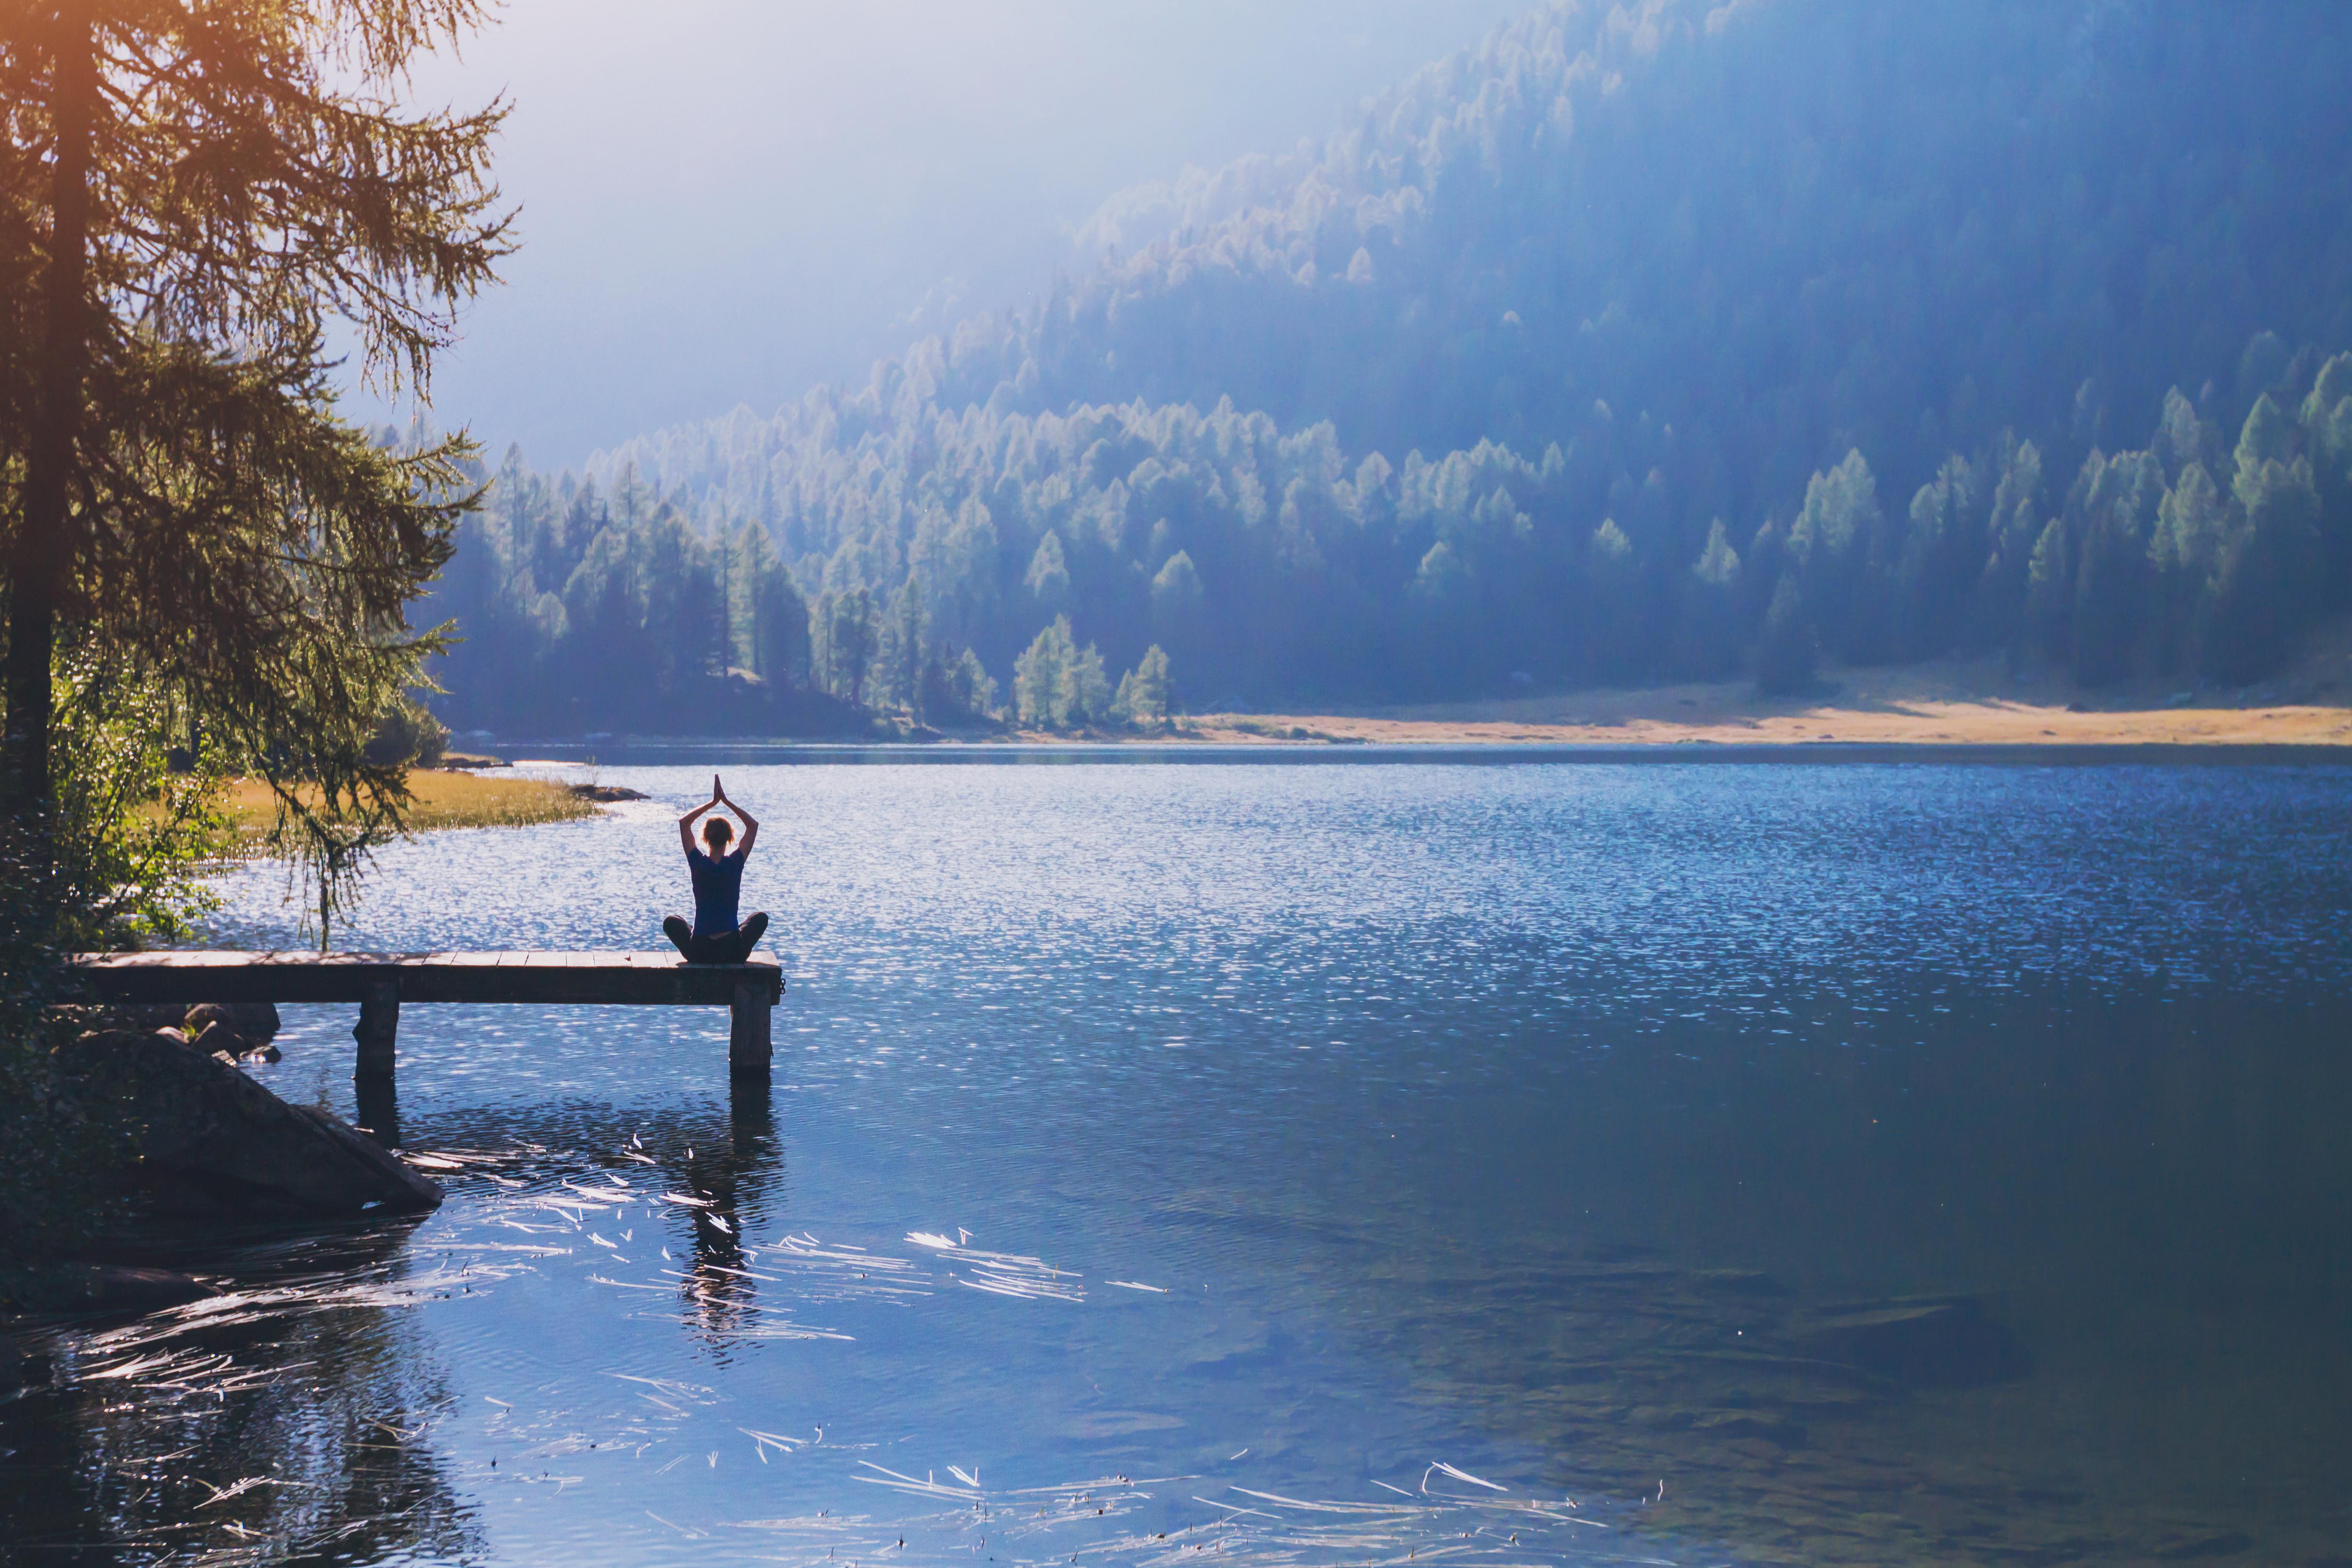 yoga beautiful background, harmony in life, meditation practice